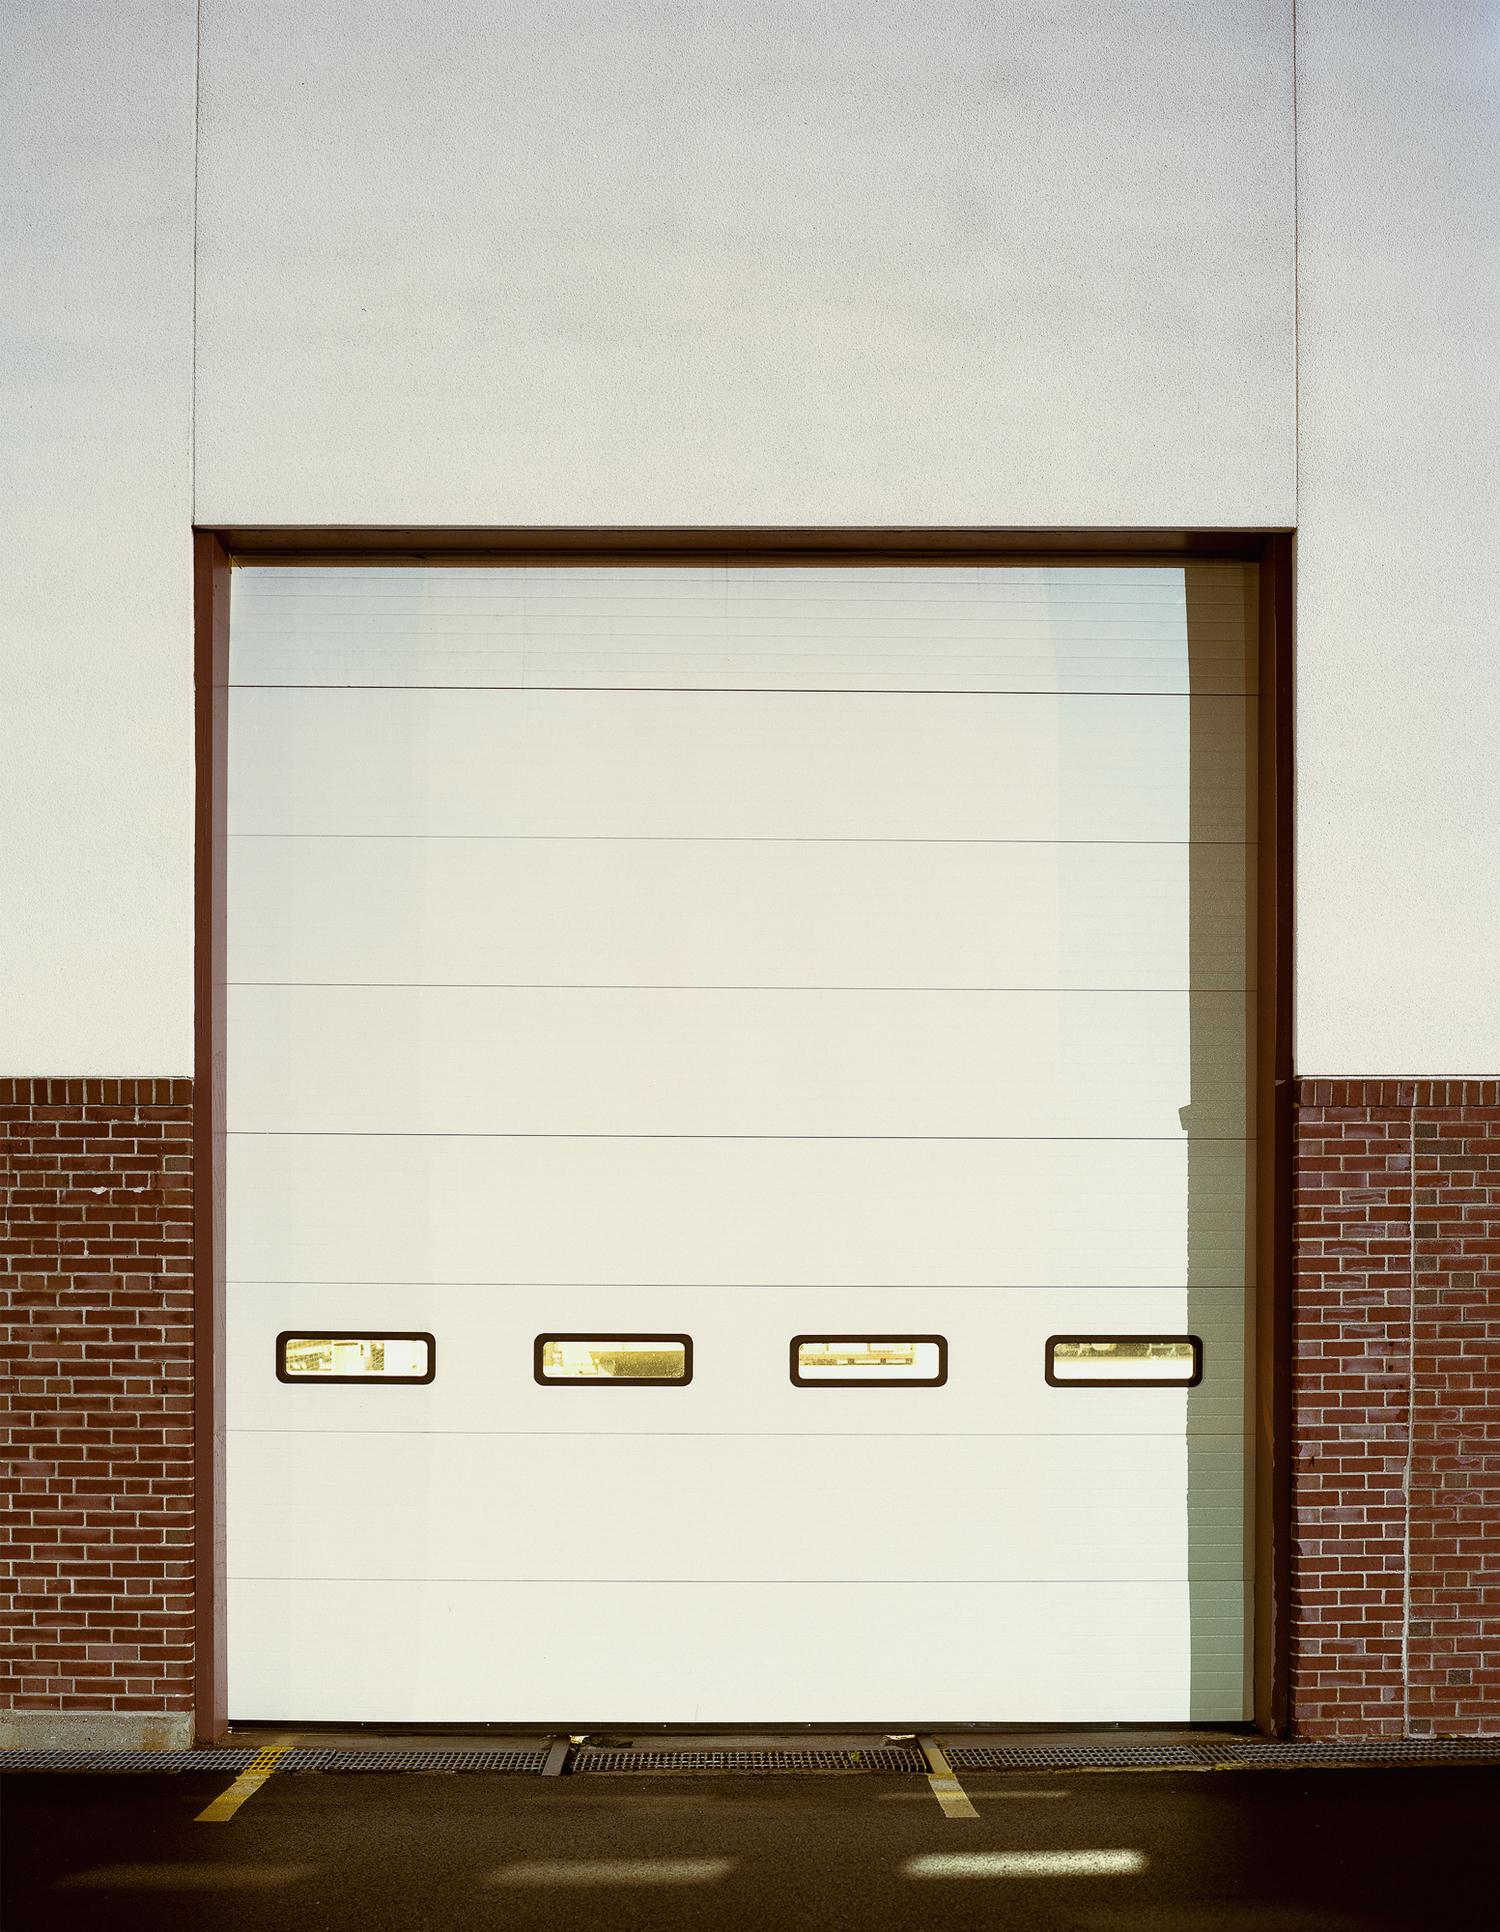 Brick_and_glass-Paul_Puiia-3.jpg